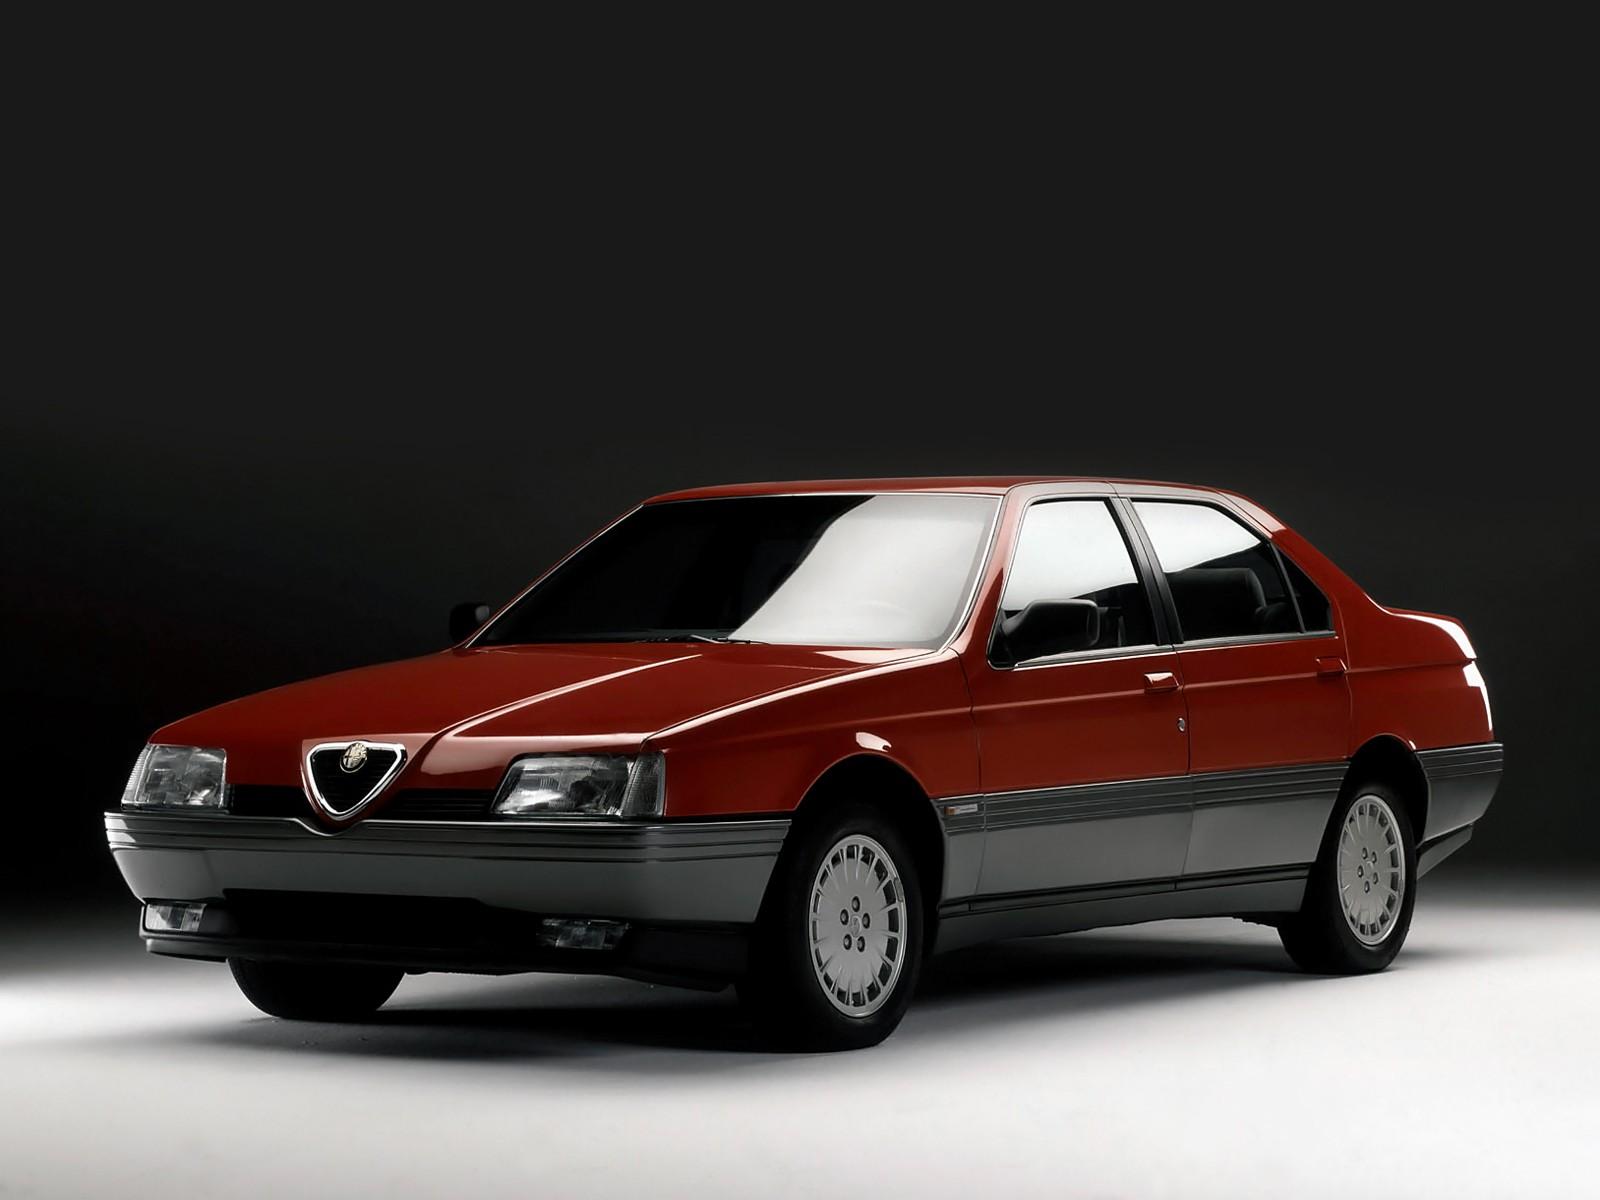 ALFA ROMEO 164 - 1988, 1989, 1990, 1991, 1992, 1993, 1994 ...